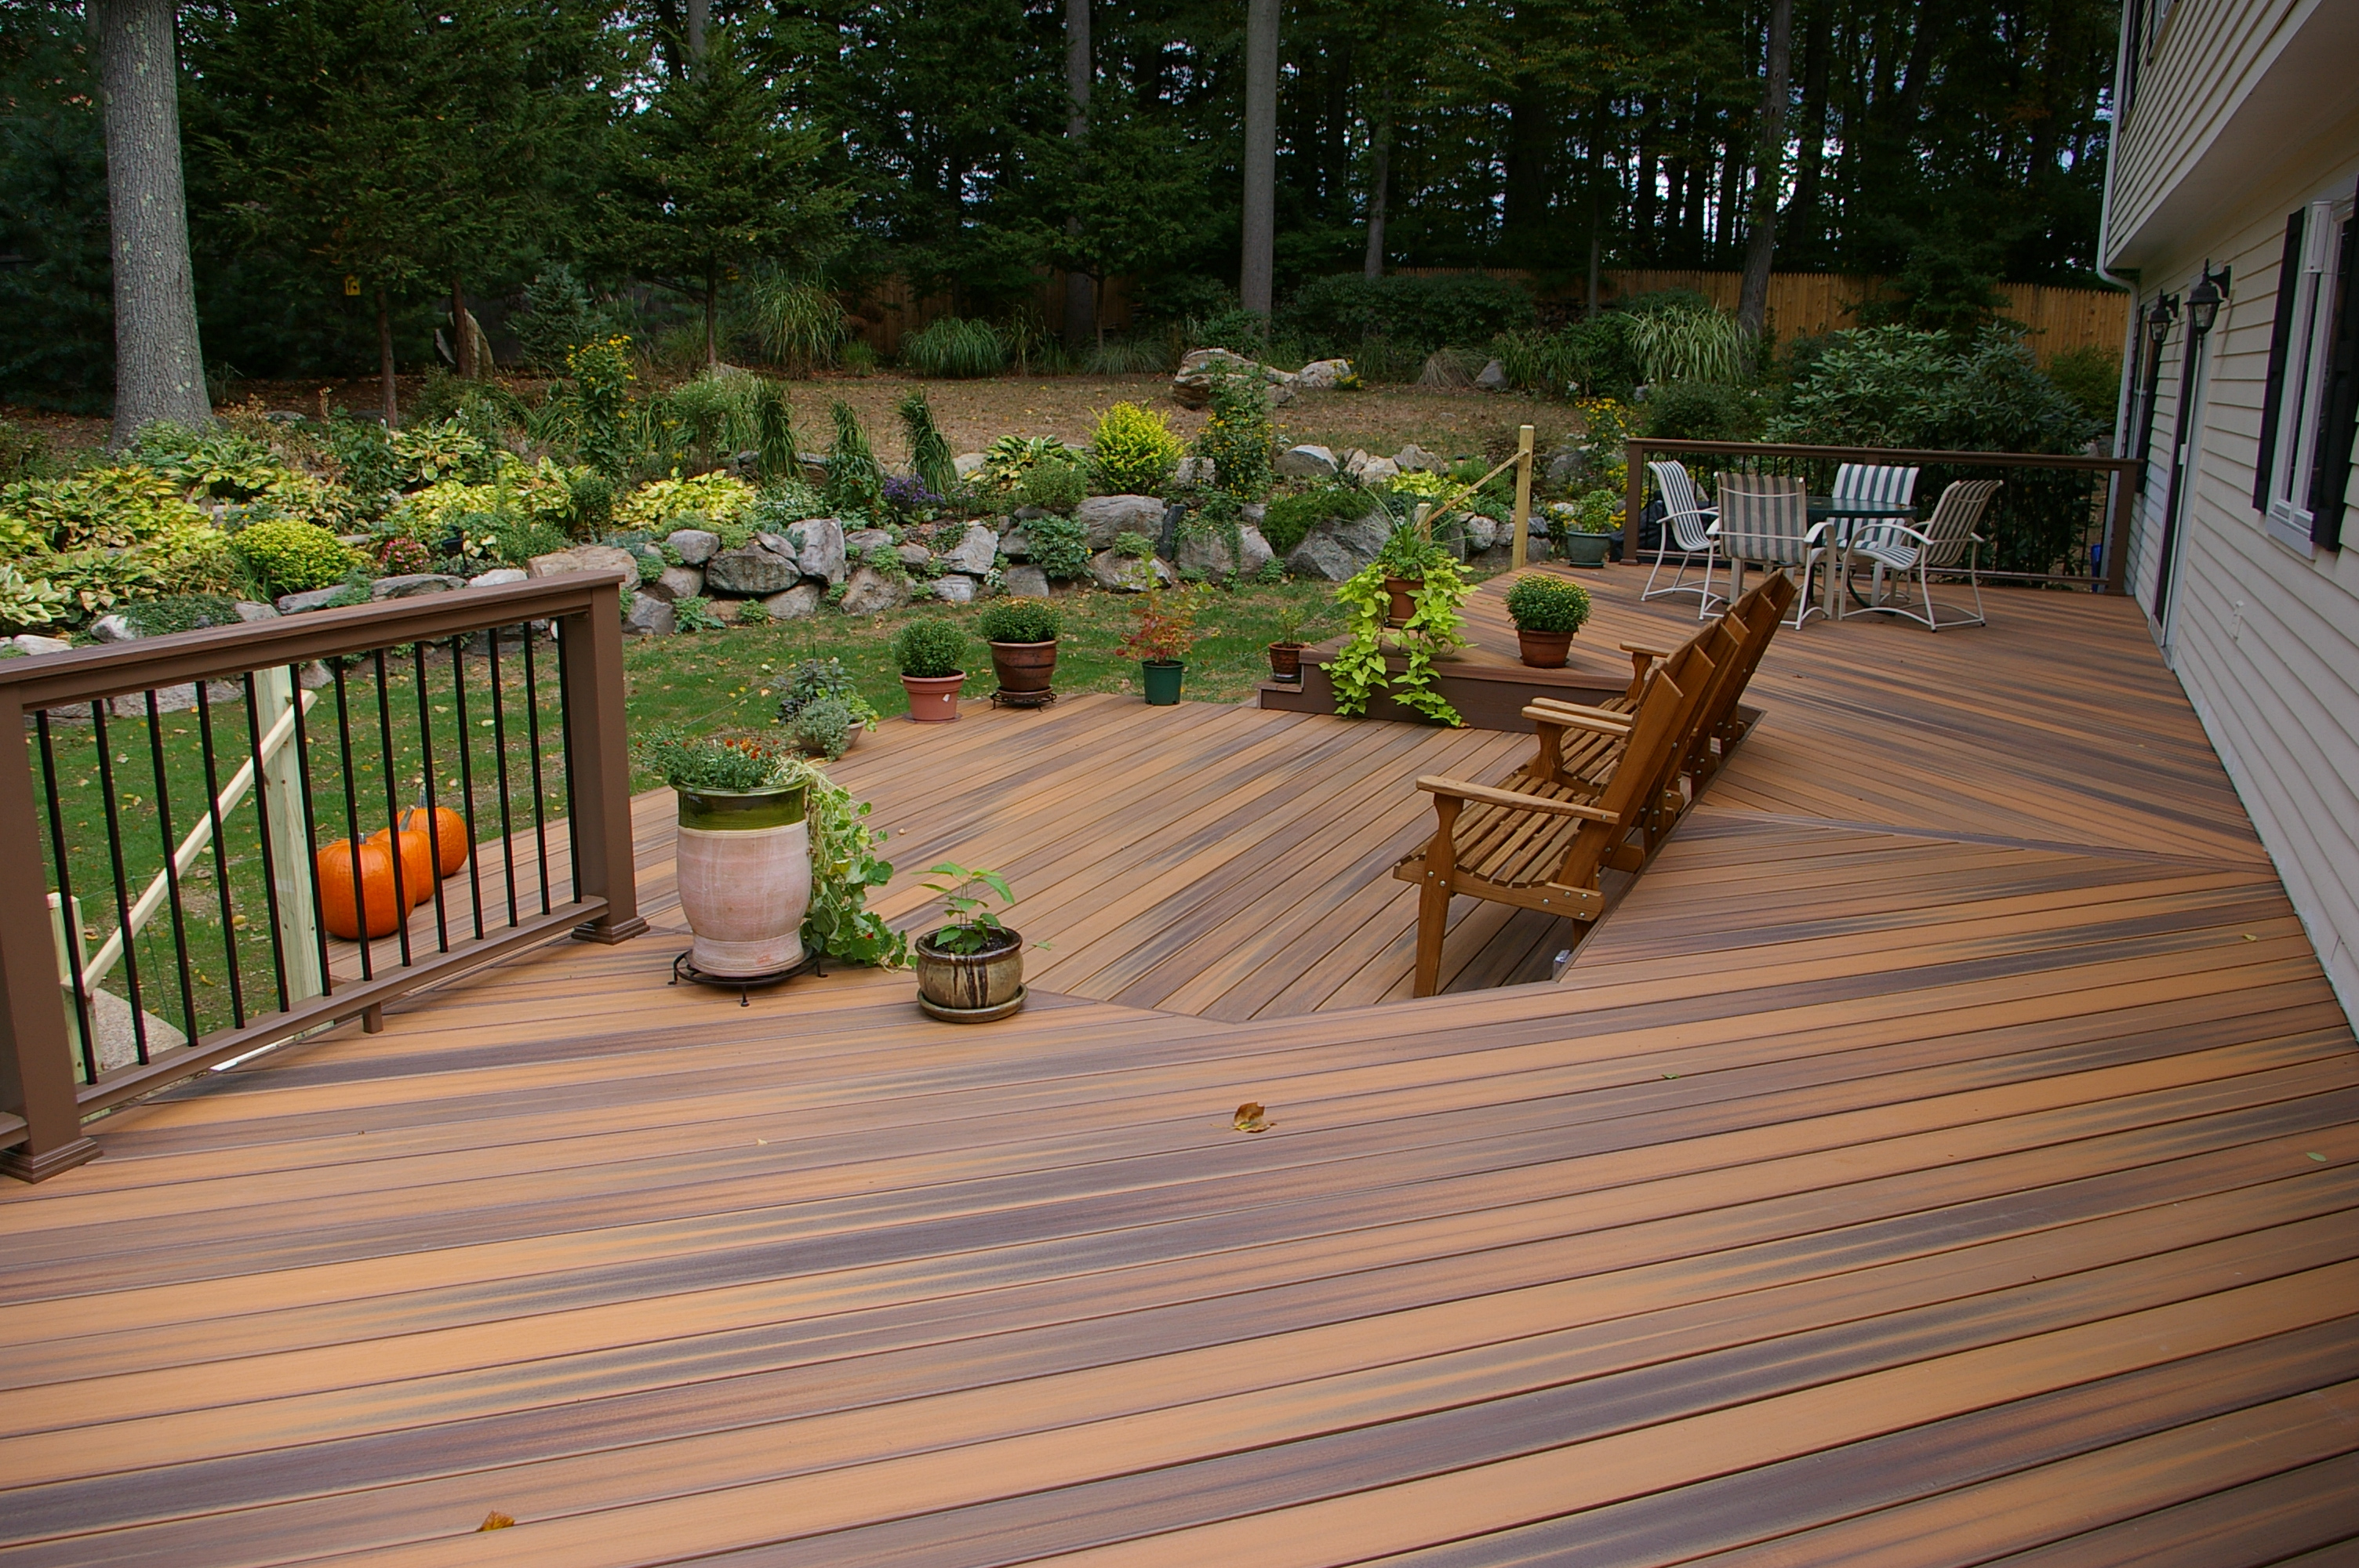 fresh outdoor life and your backyardcustom decks of fairfield